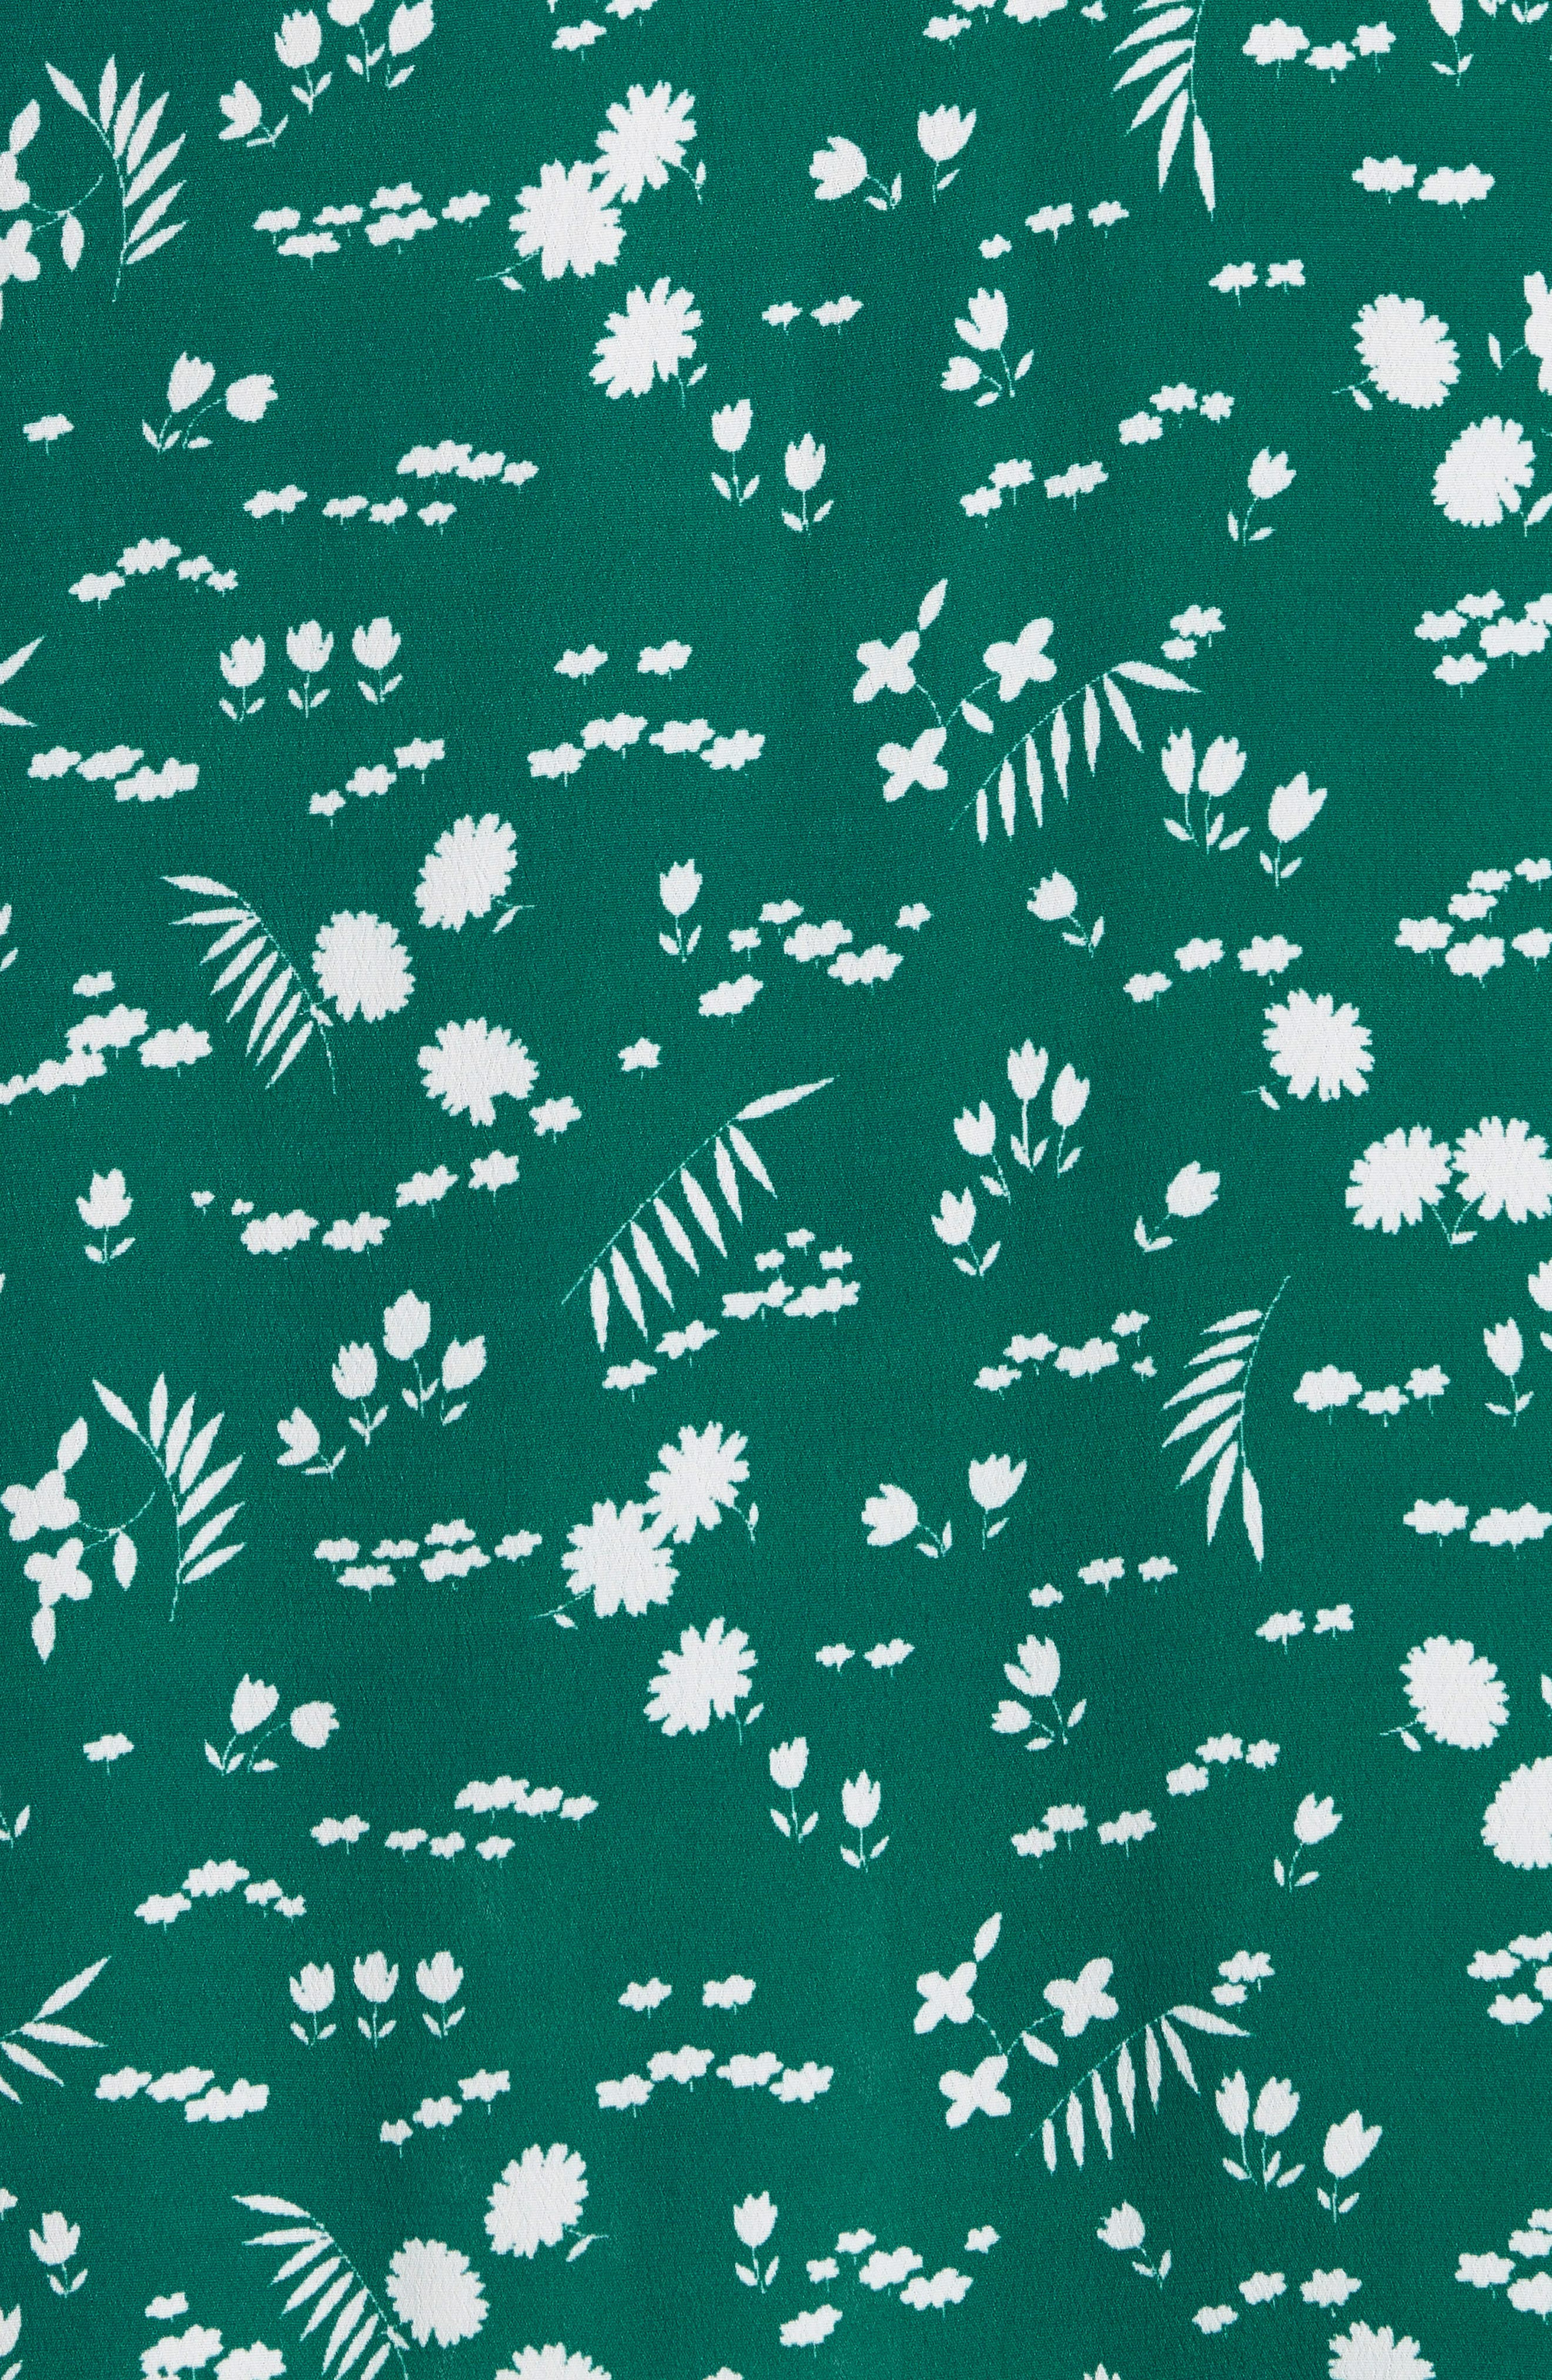 Floral High/Low Wrap Skirt,                             Alternate thumbnail 5, color,                             900